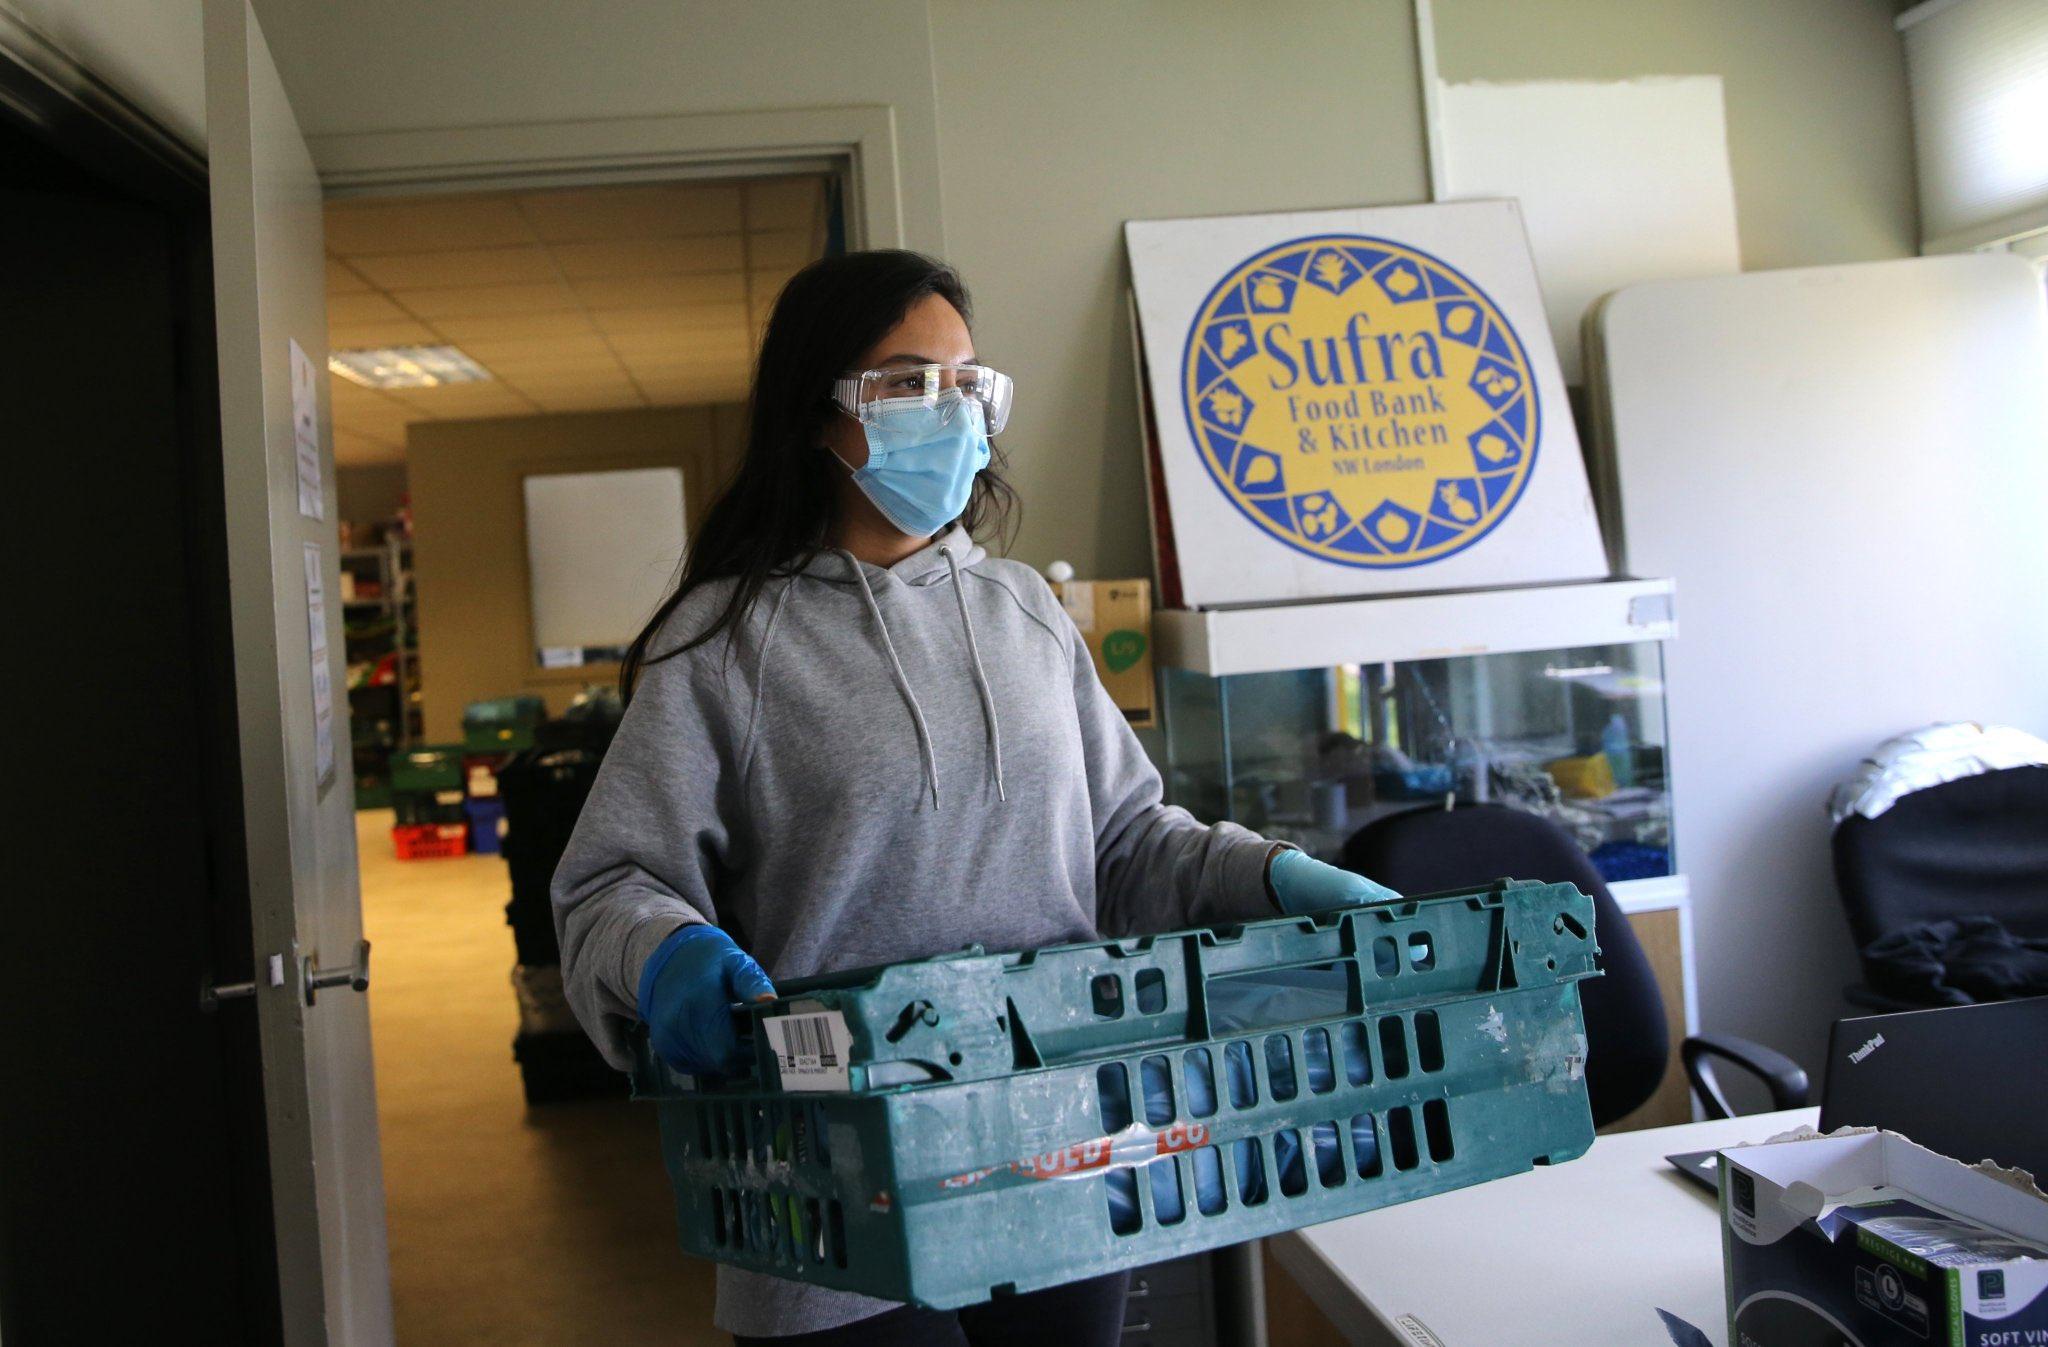 We're Benefiting From a Major Coronavirus Charity Match-funding Scheme